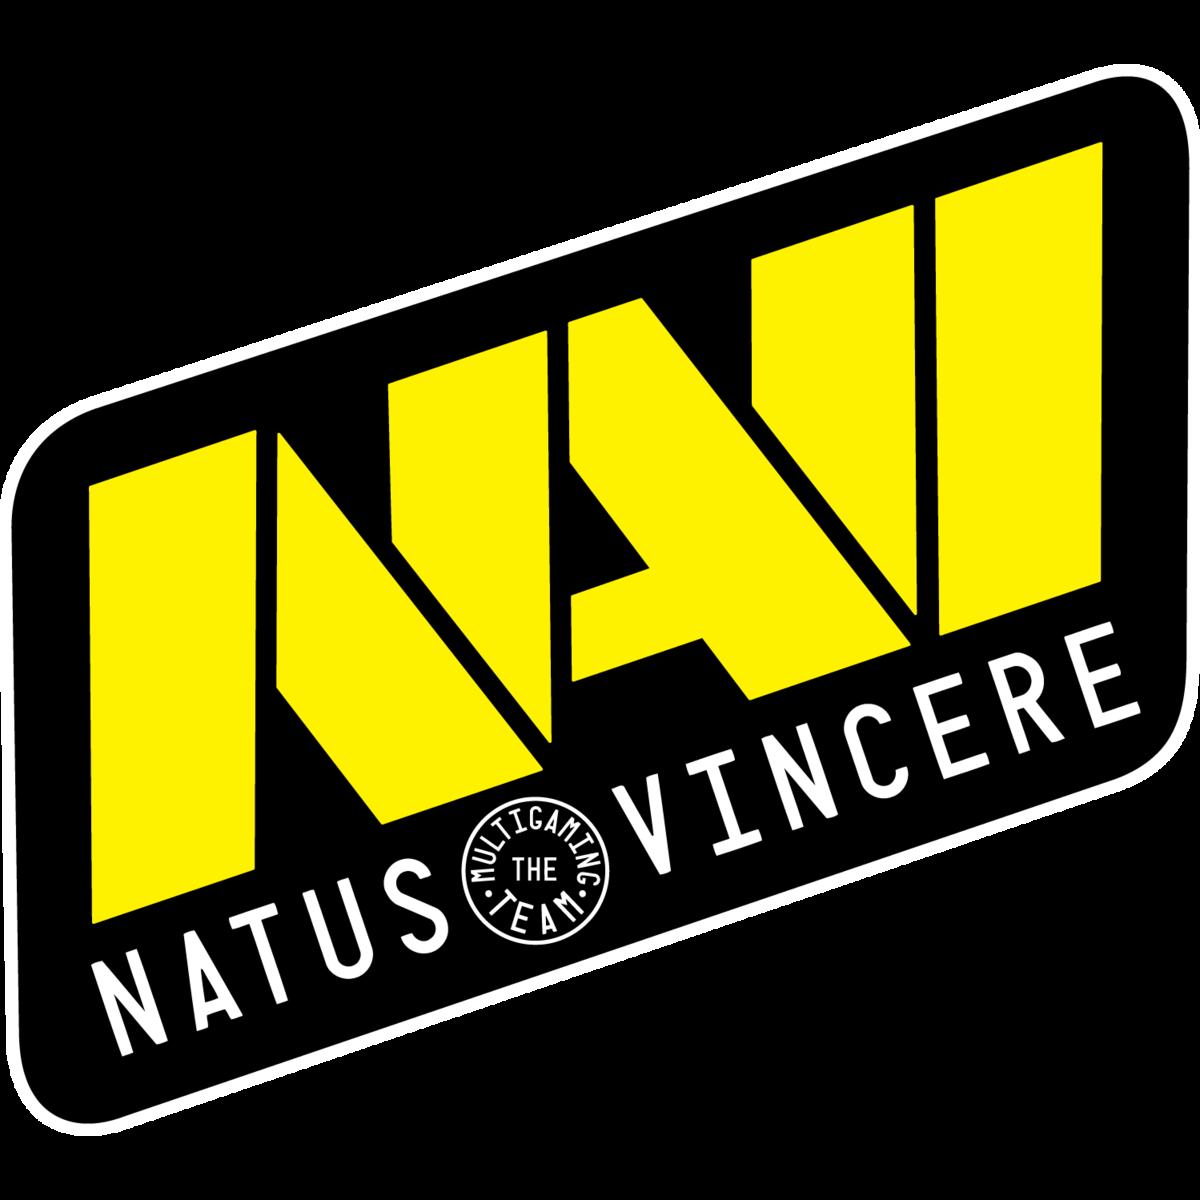 Natus Vincere.